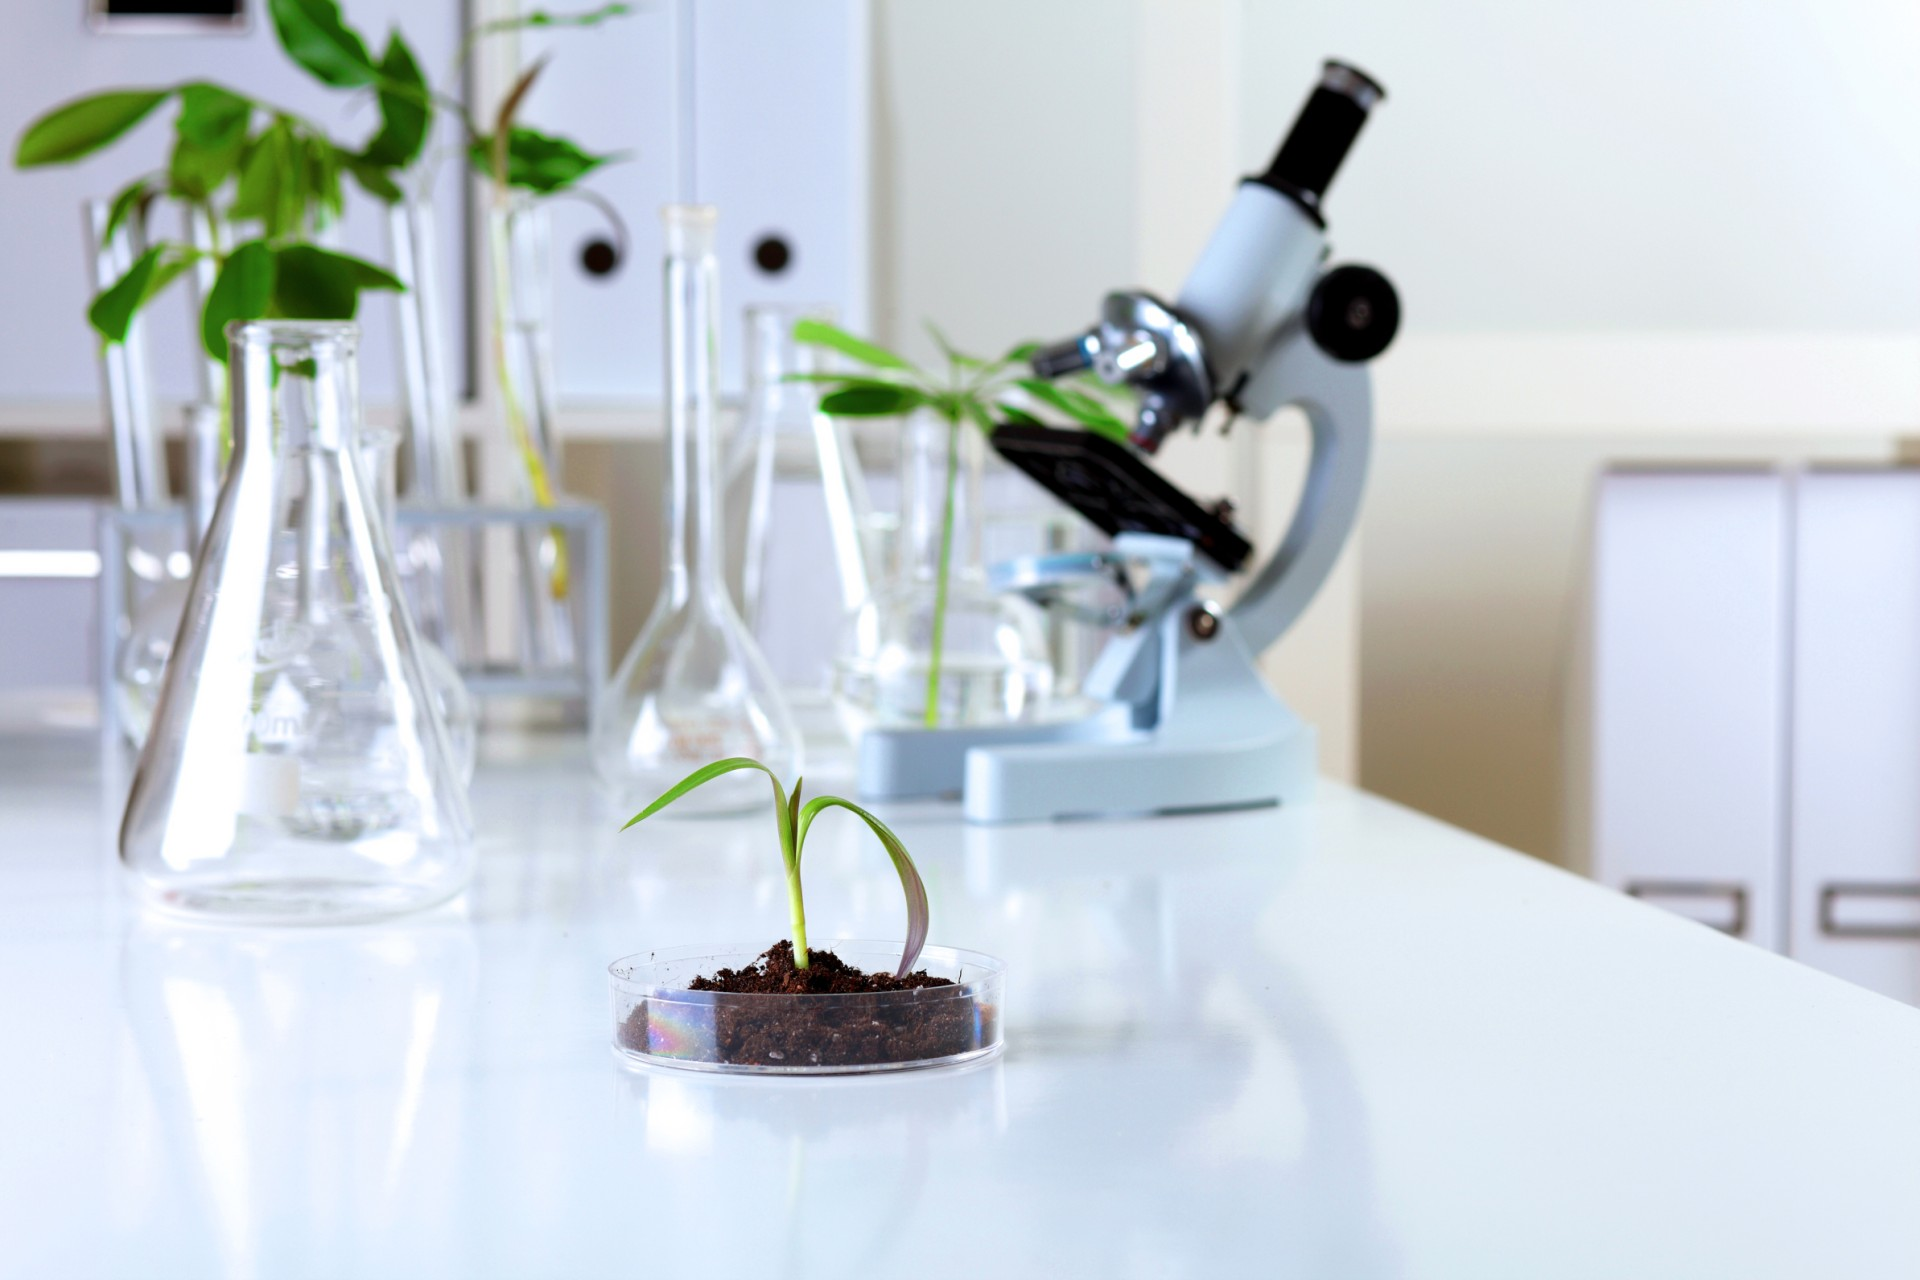 Kozzi-green-plants-in-biology-laborotary-2387-X-1591